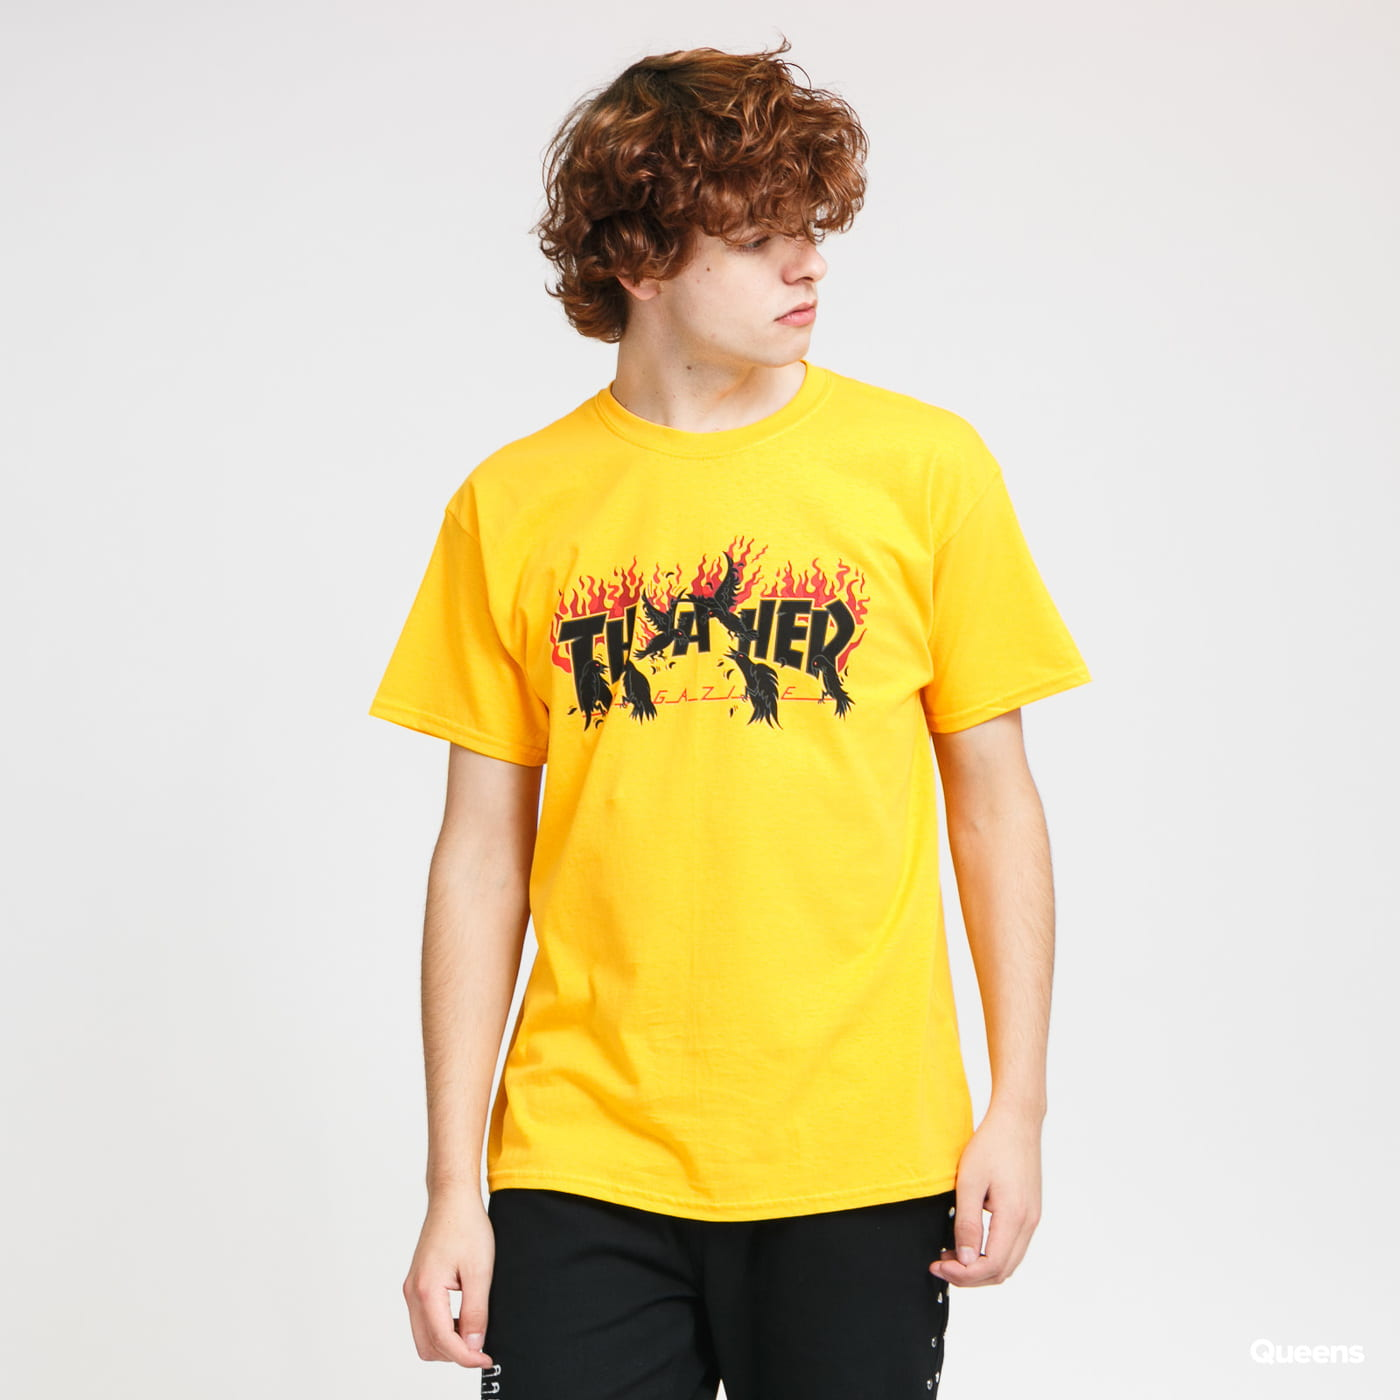 Thrasher Crows Tee yellow